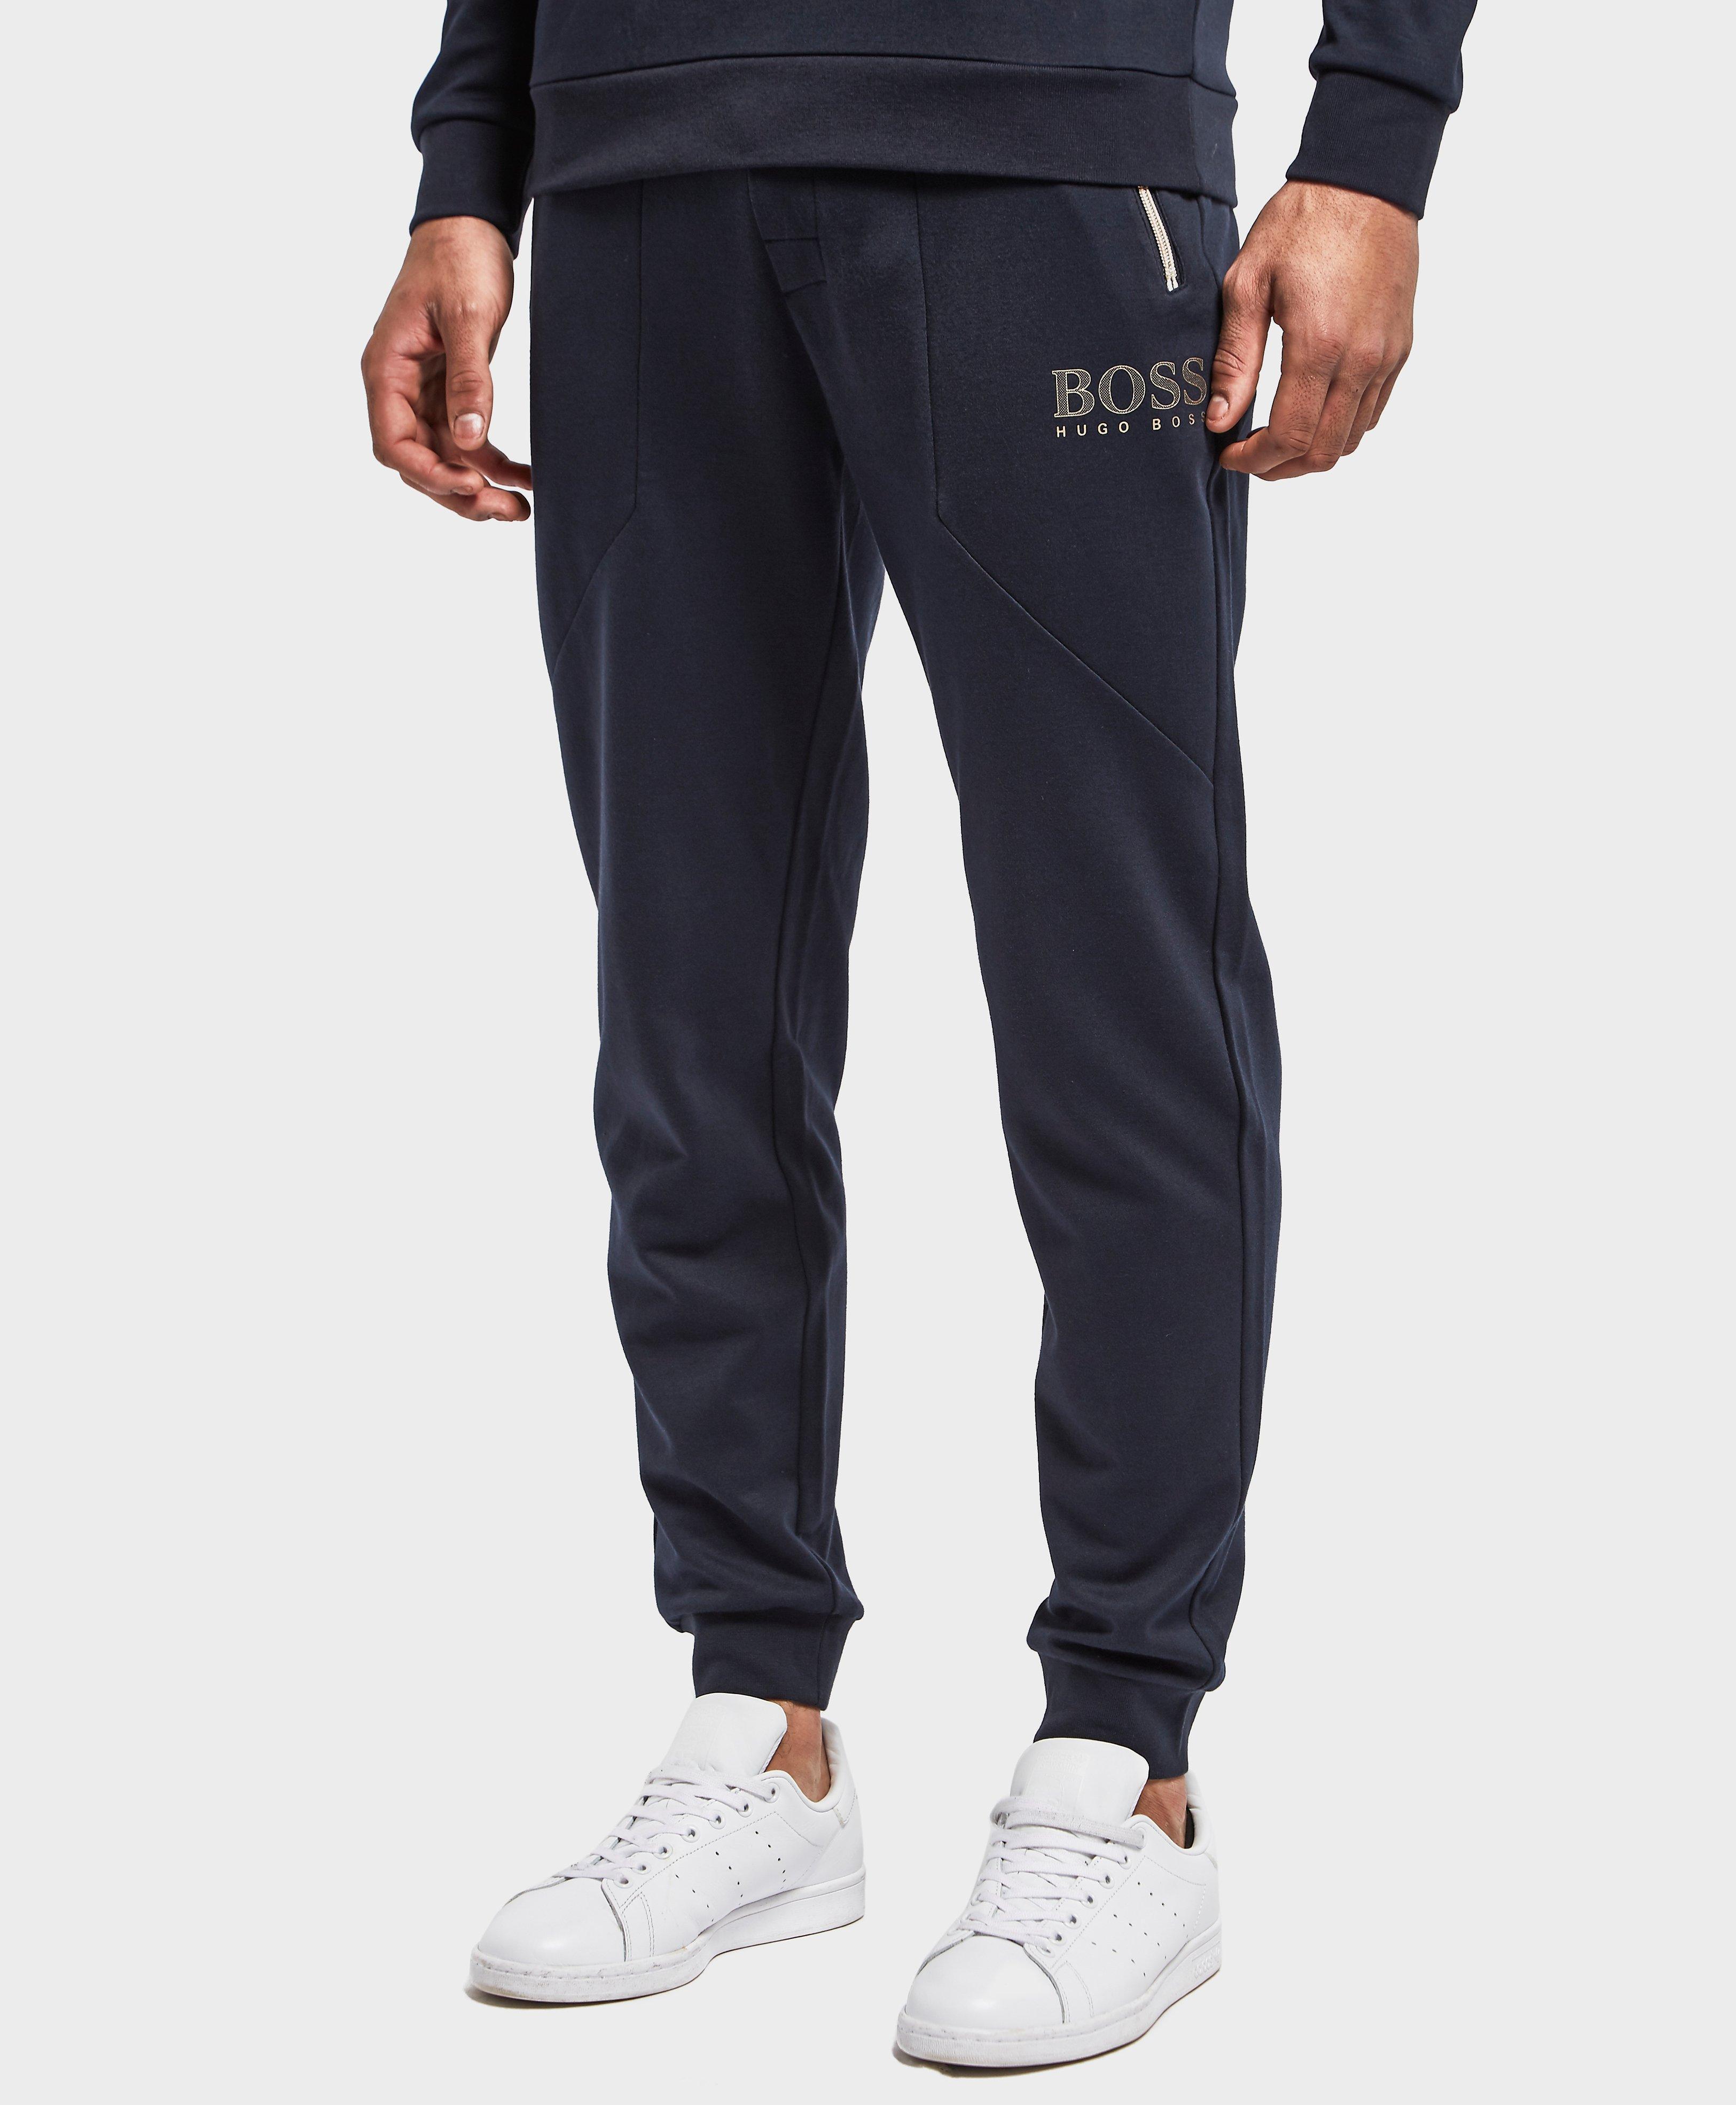 BOSS. Men's Blue Poly Pique Cuffed Track Pants